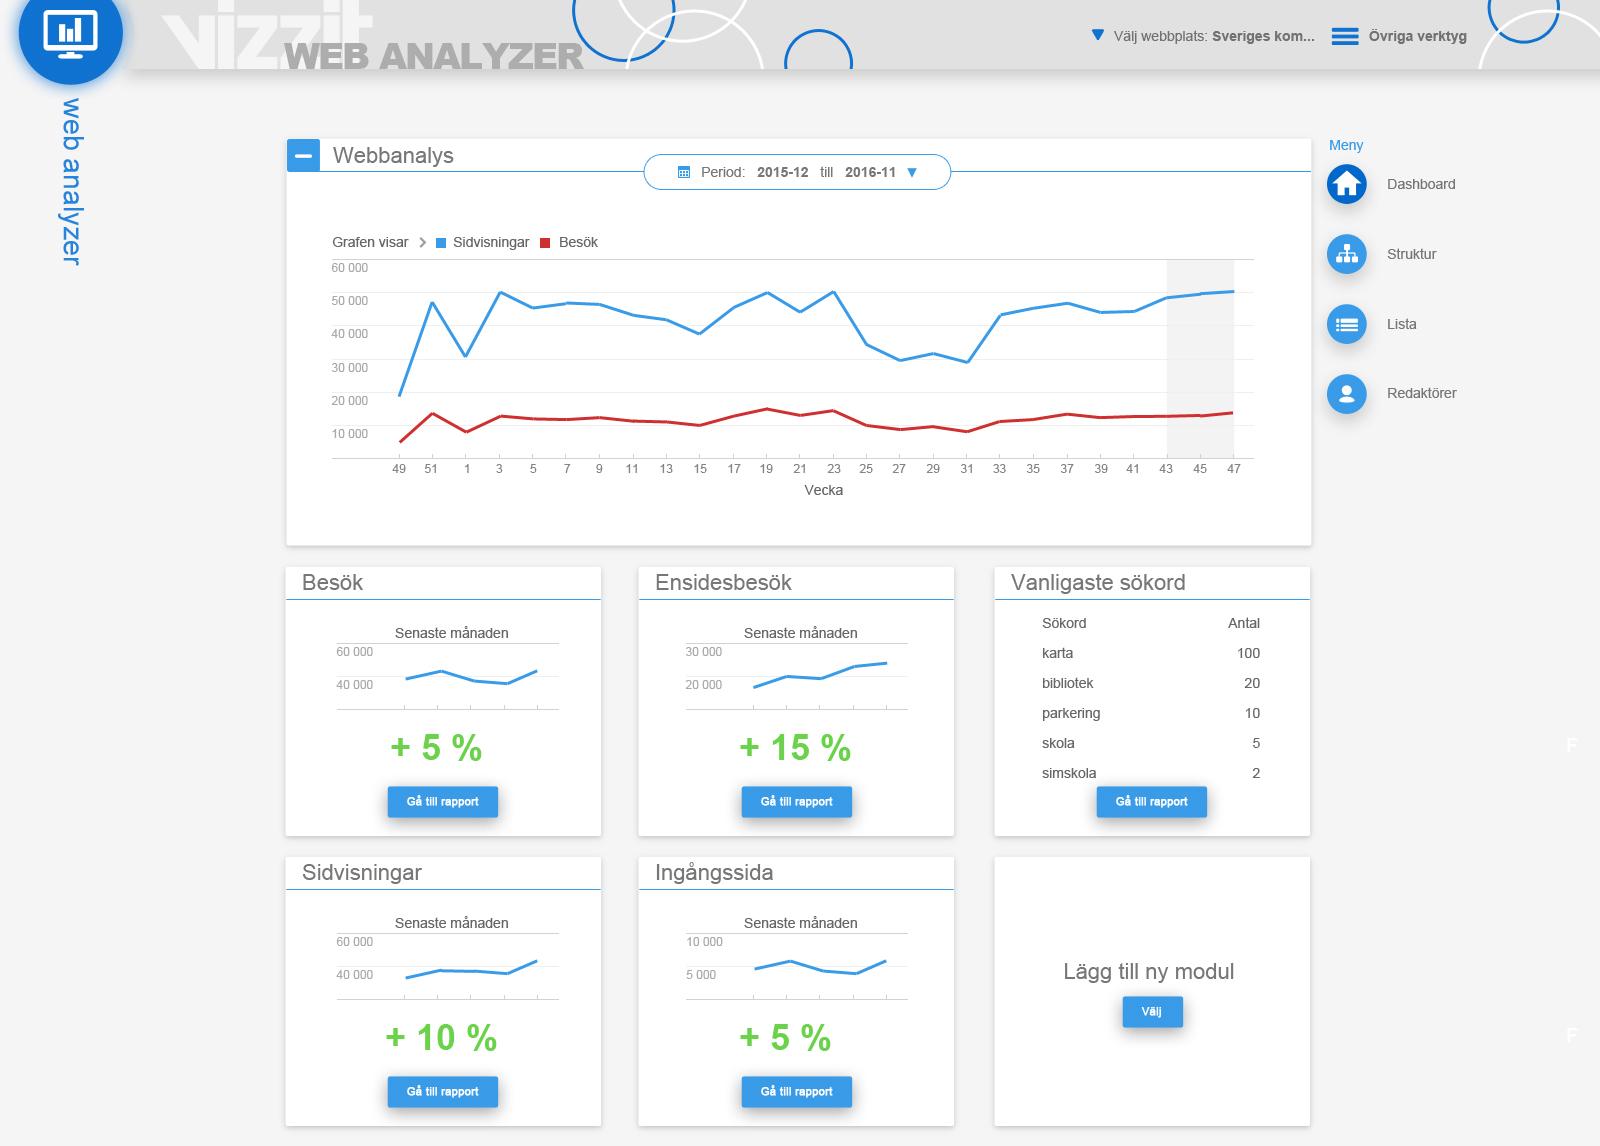 webanalyzer.dashboard